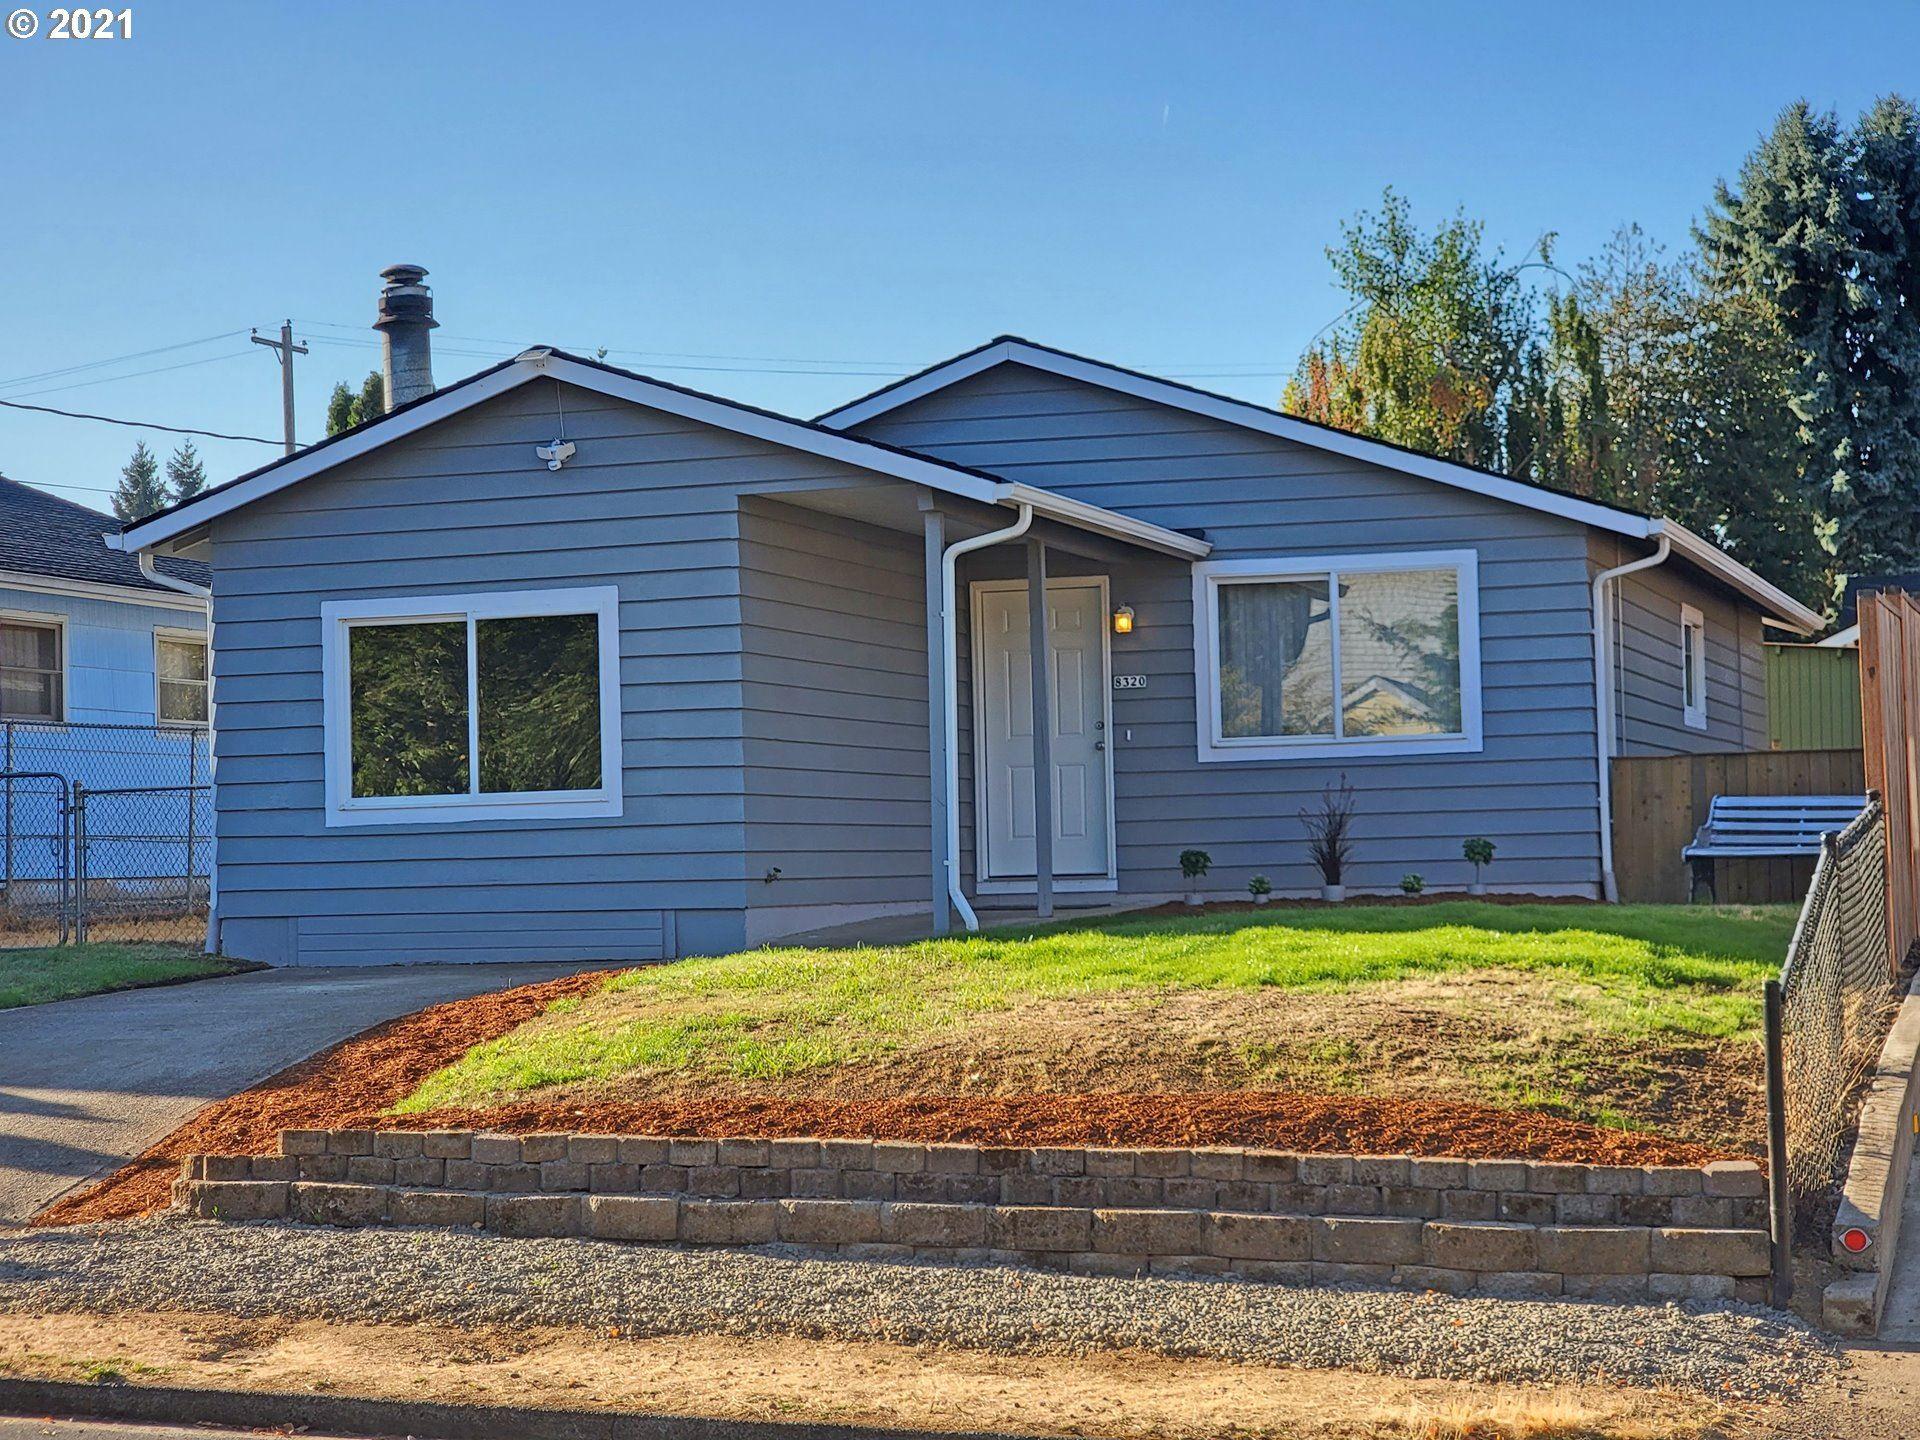 8320 NE SACRAMENTO ST, Portland, OR 97220 - MLS#: 21221512